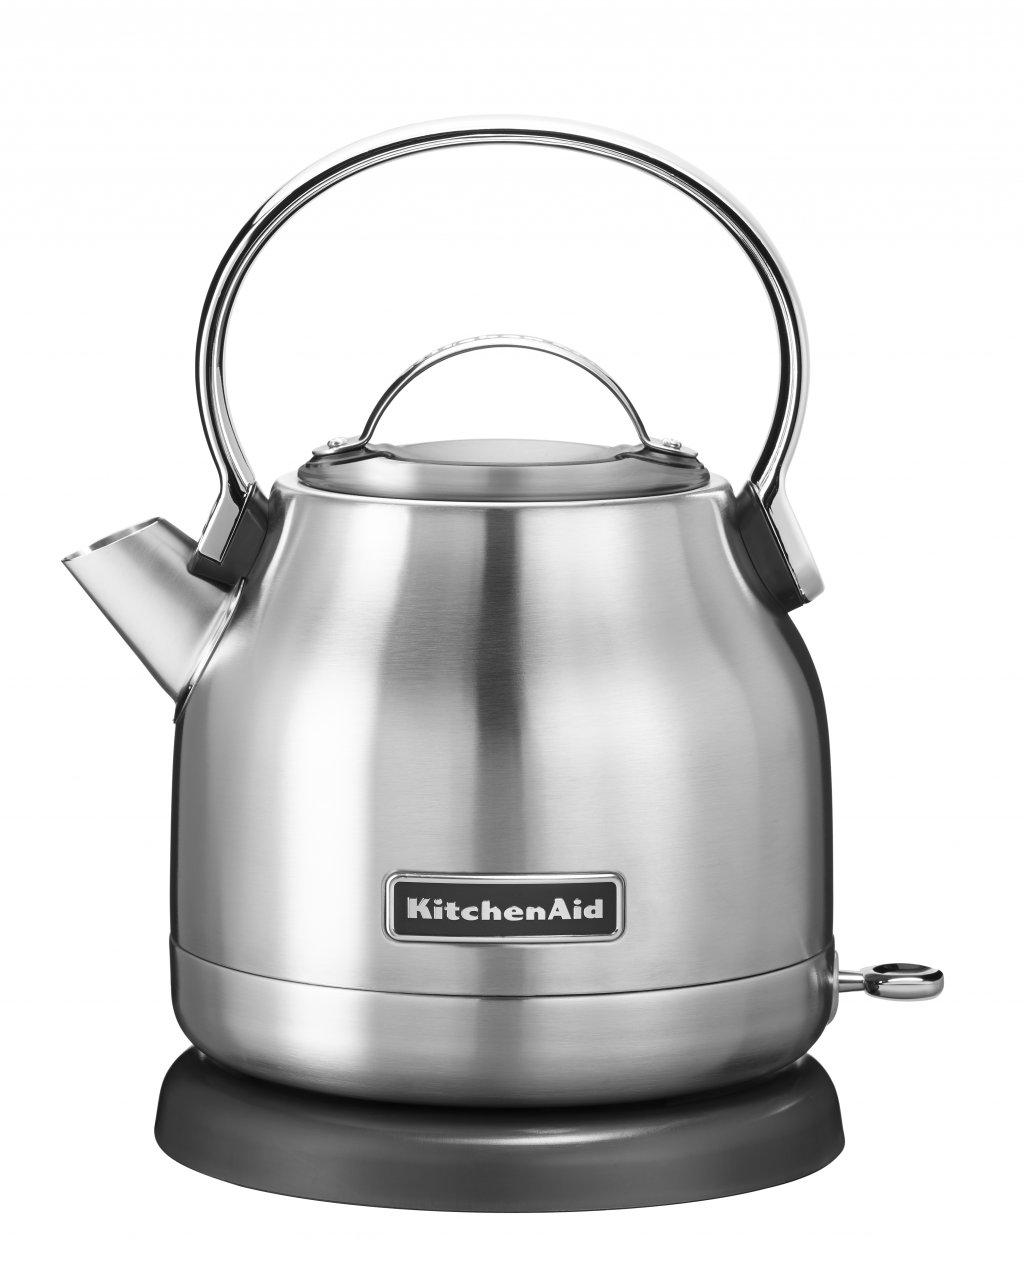 Kitchenaid Kek1222 Kettle 1 25l Stainless Steel Chef S